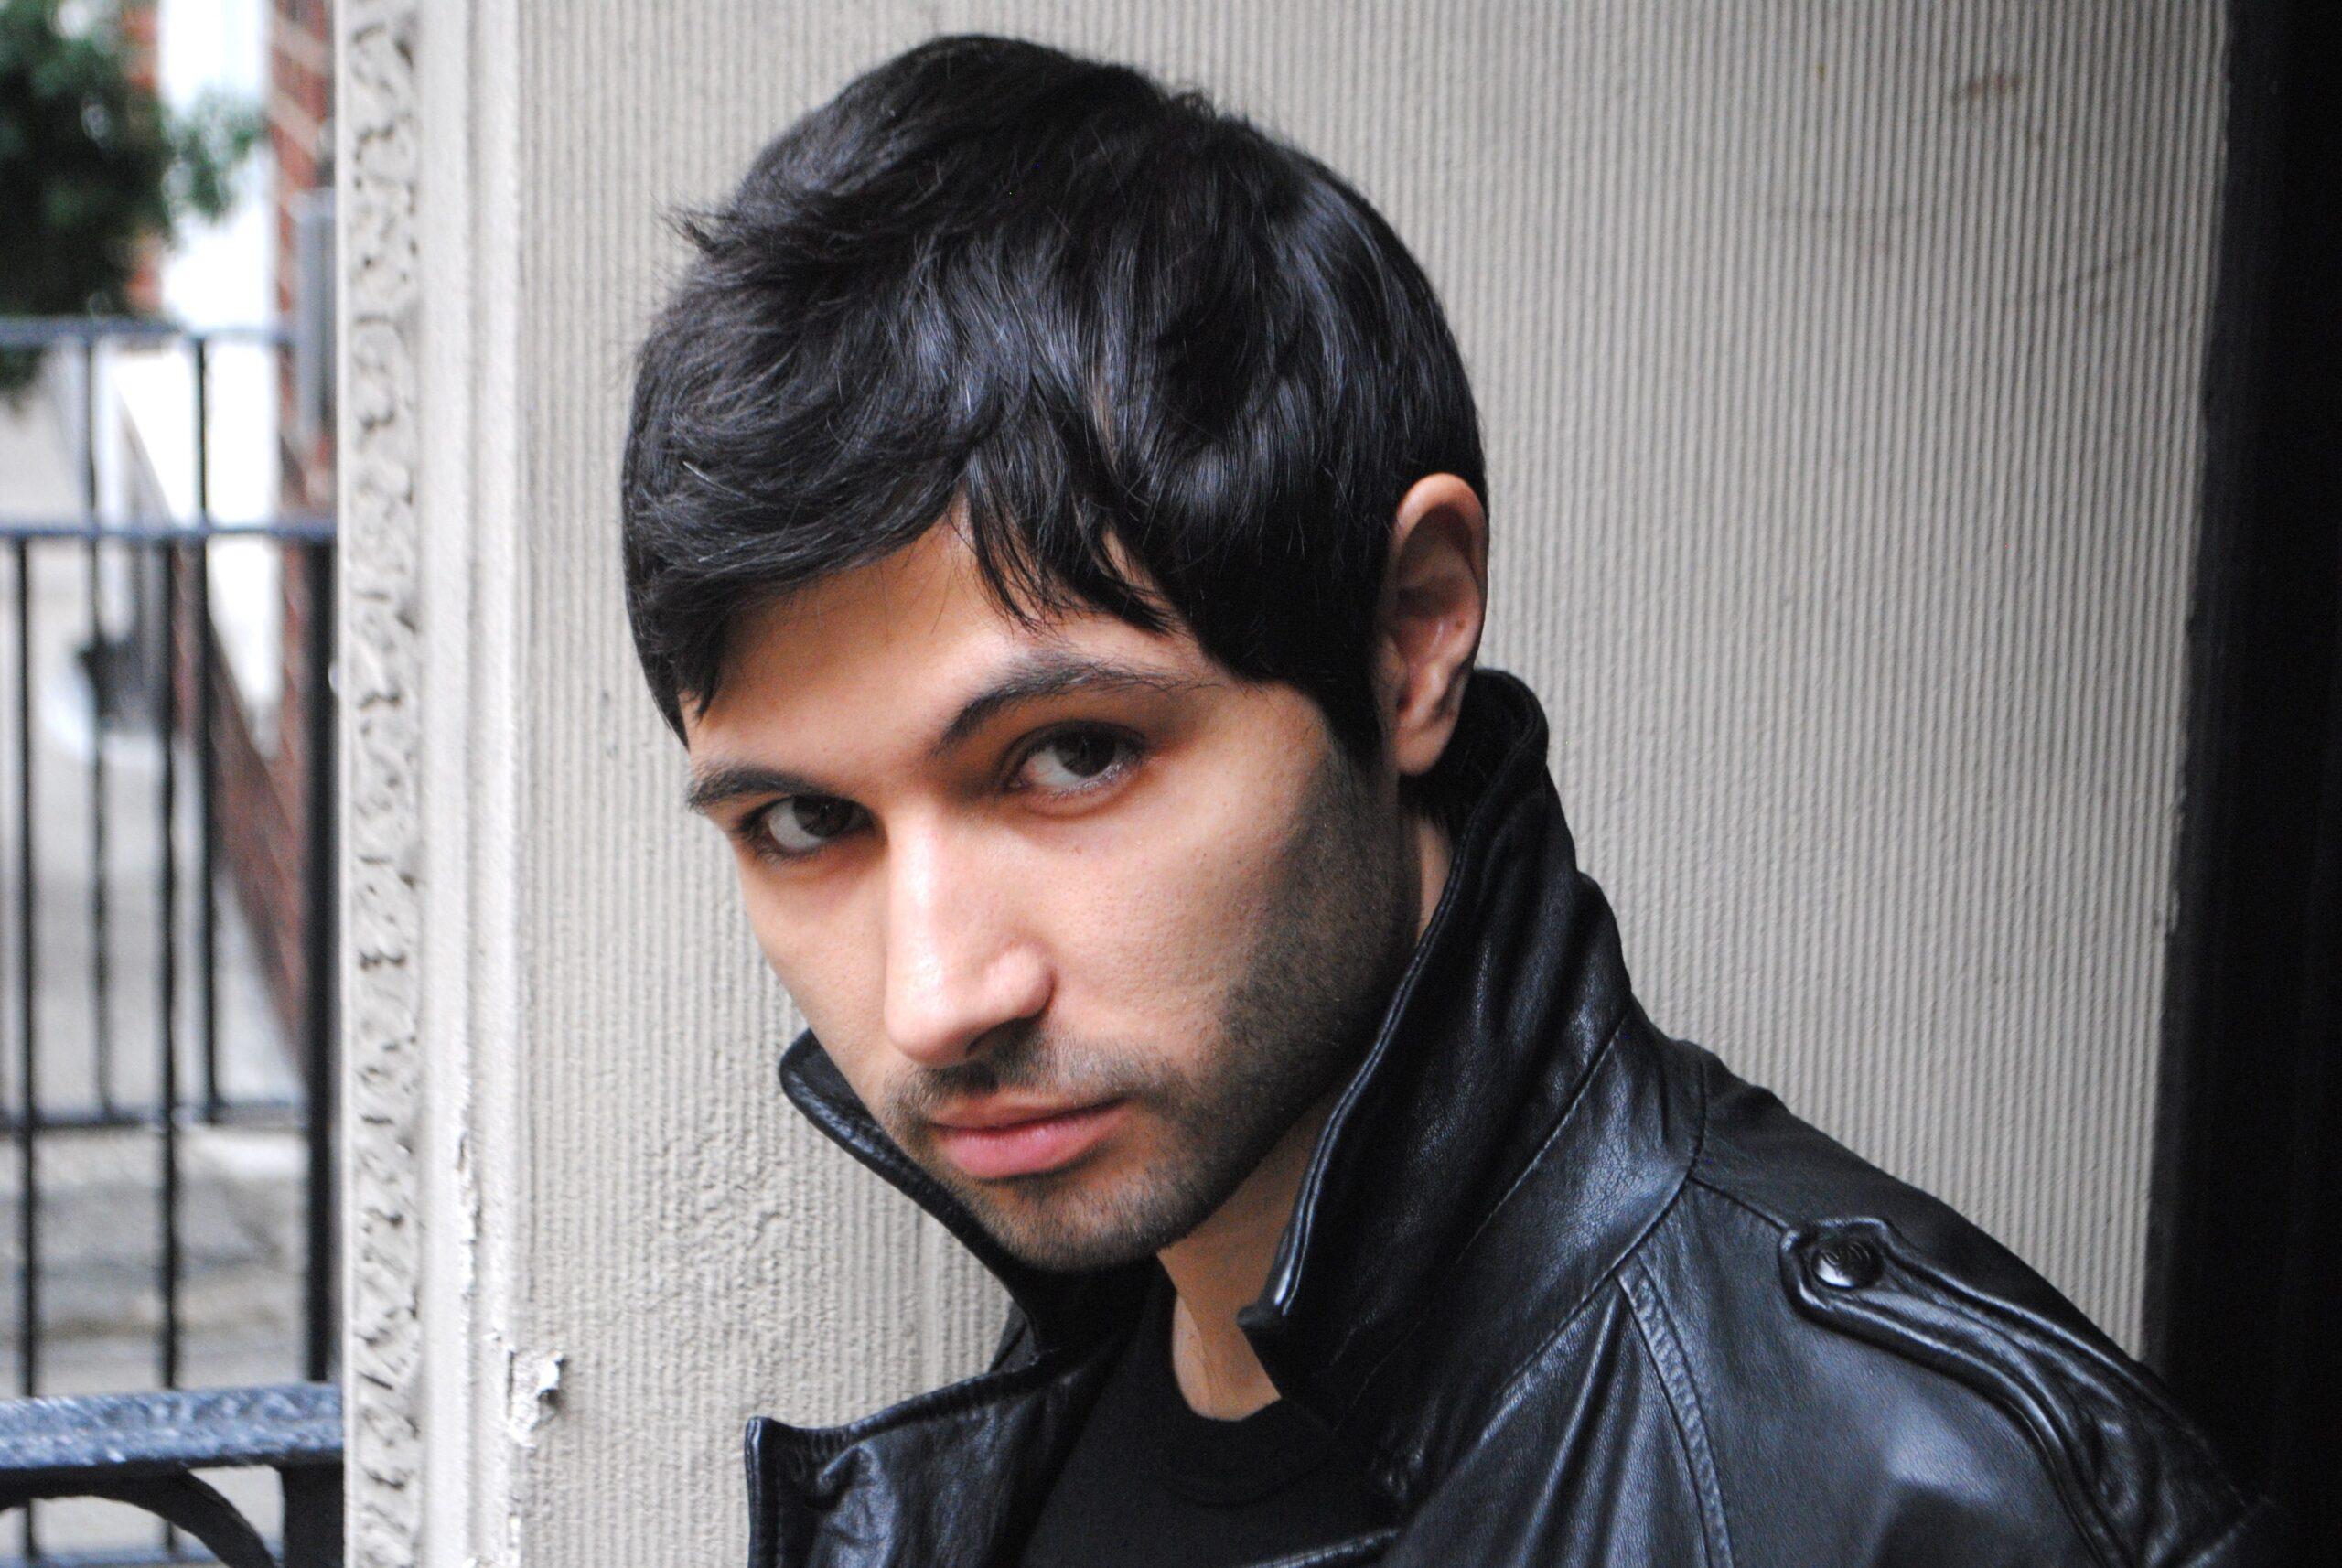 Author Photo: (c) 2011 Star Black